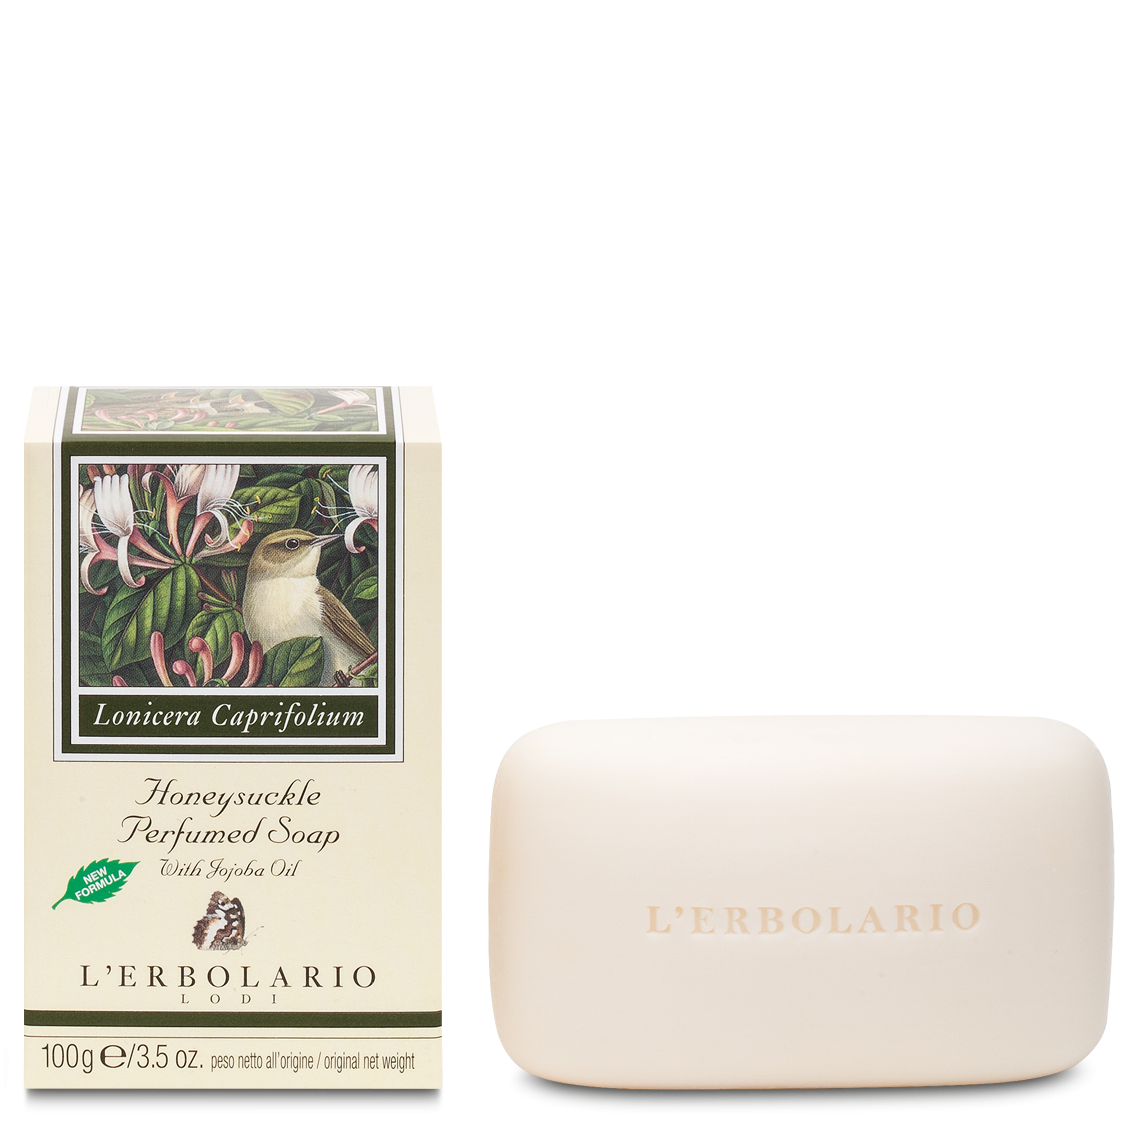 Non perfumed soap